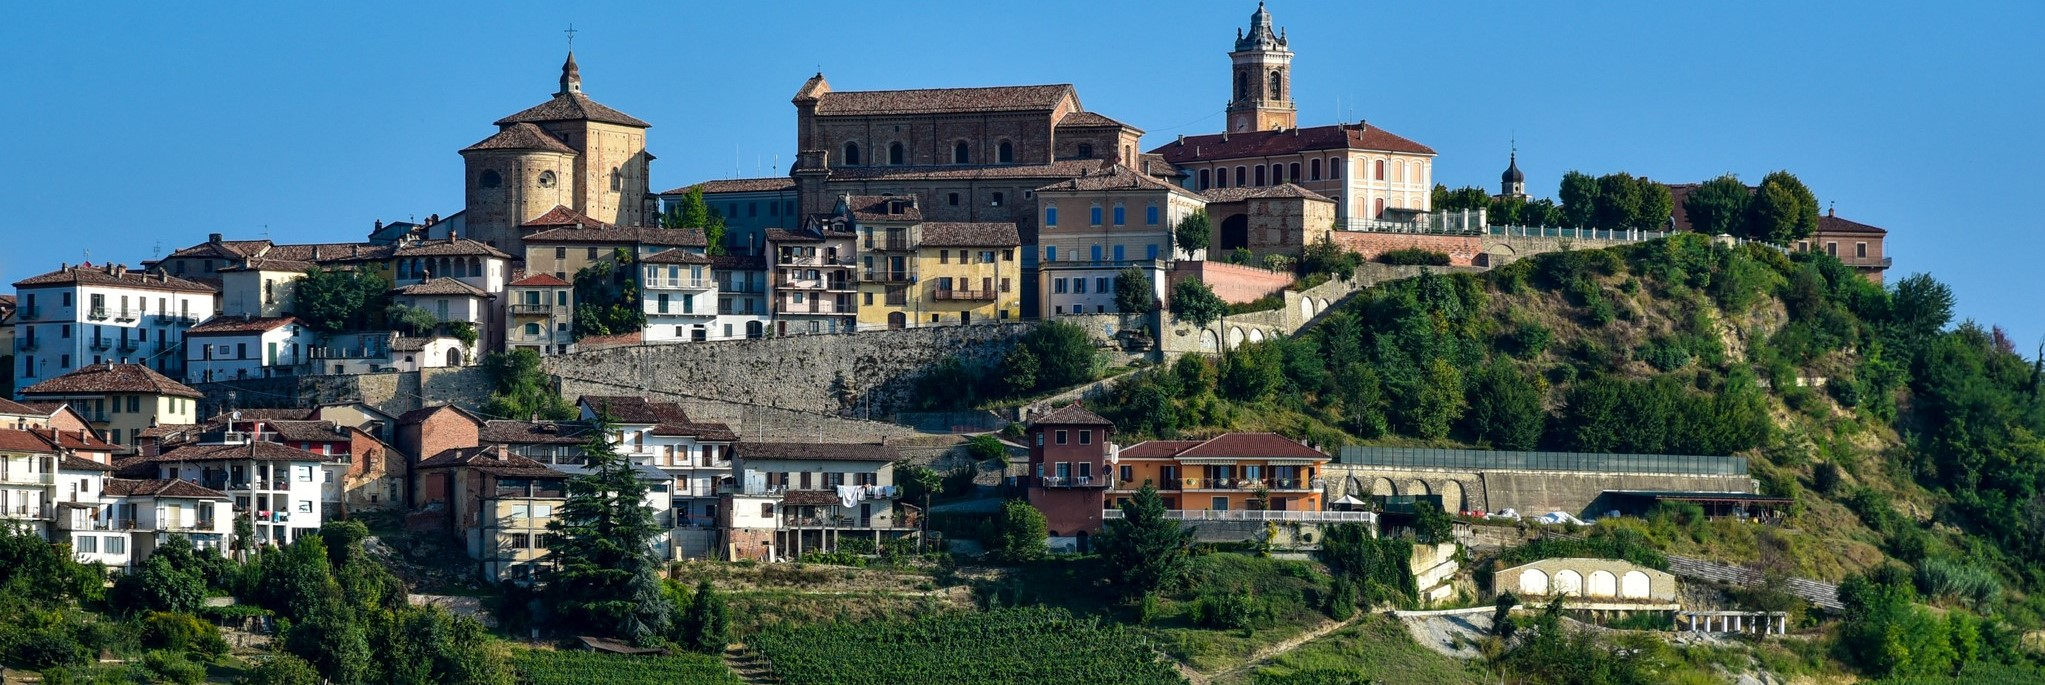 Taliansko - Piemont (3)